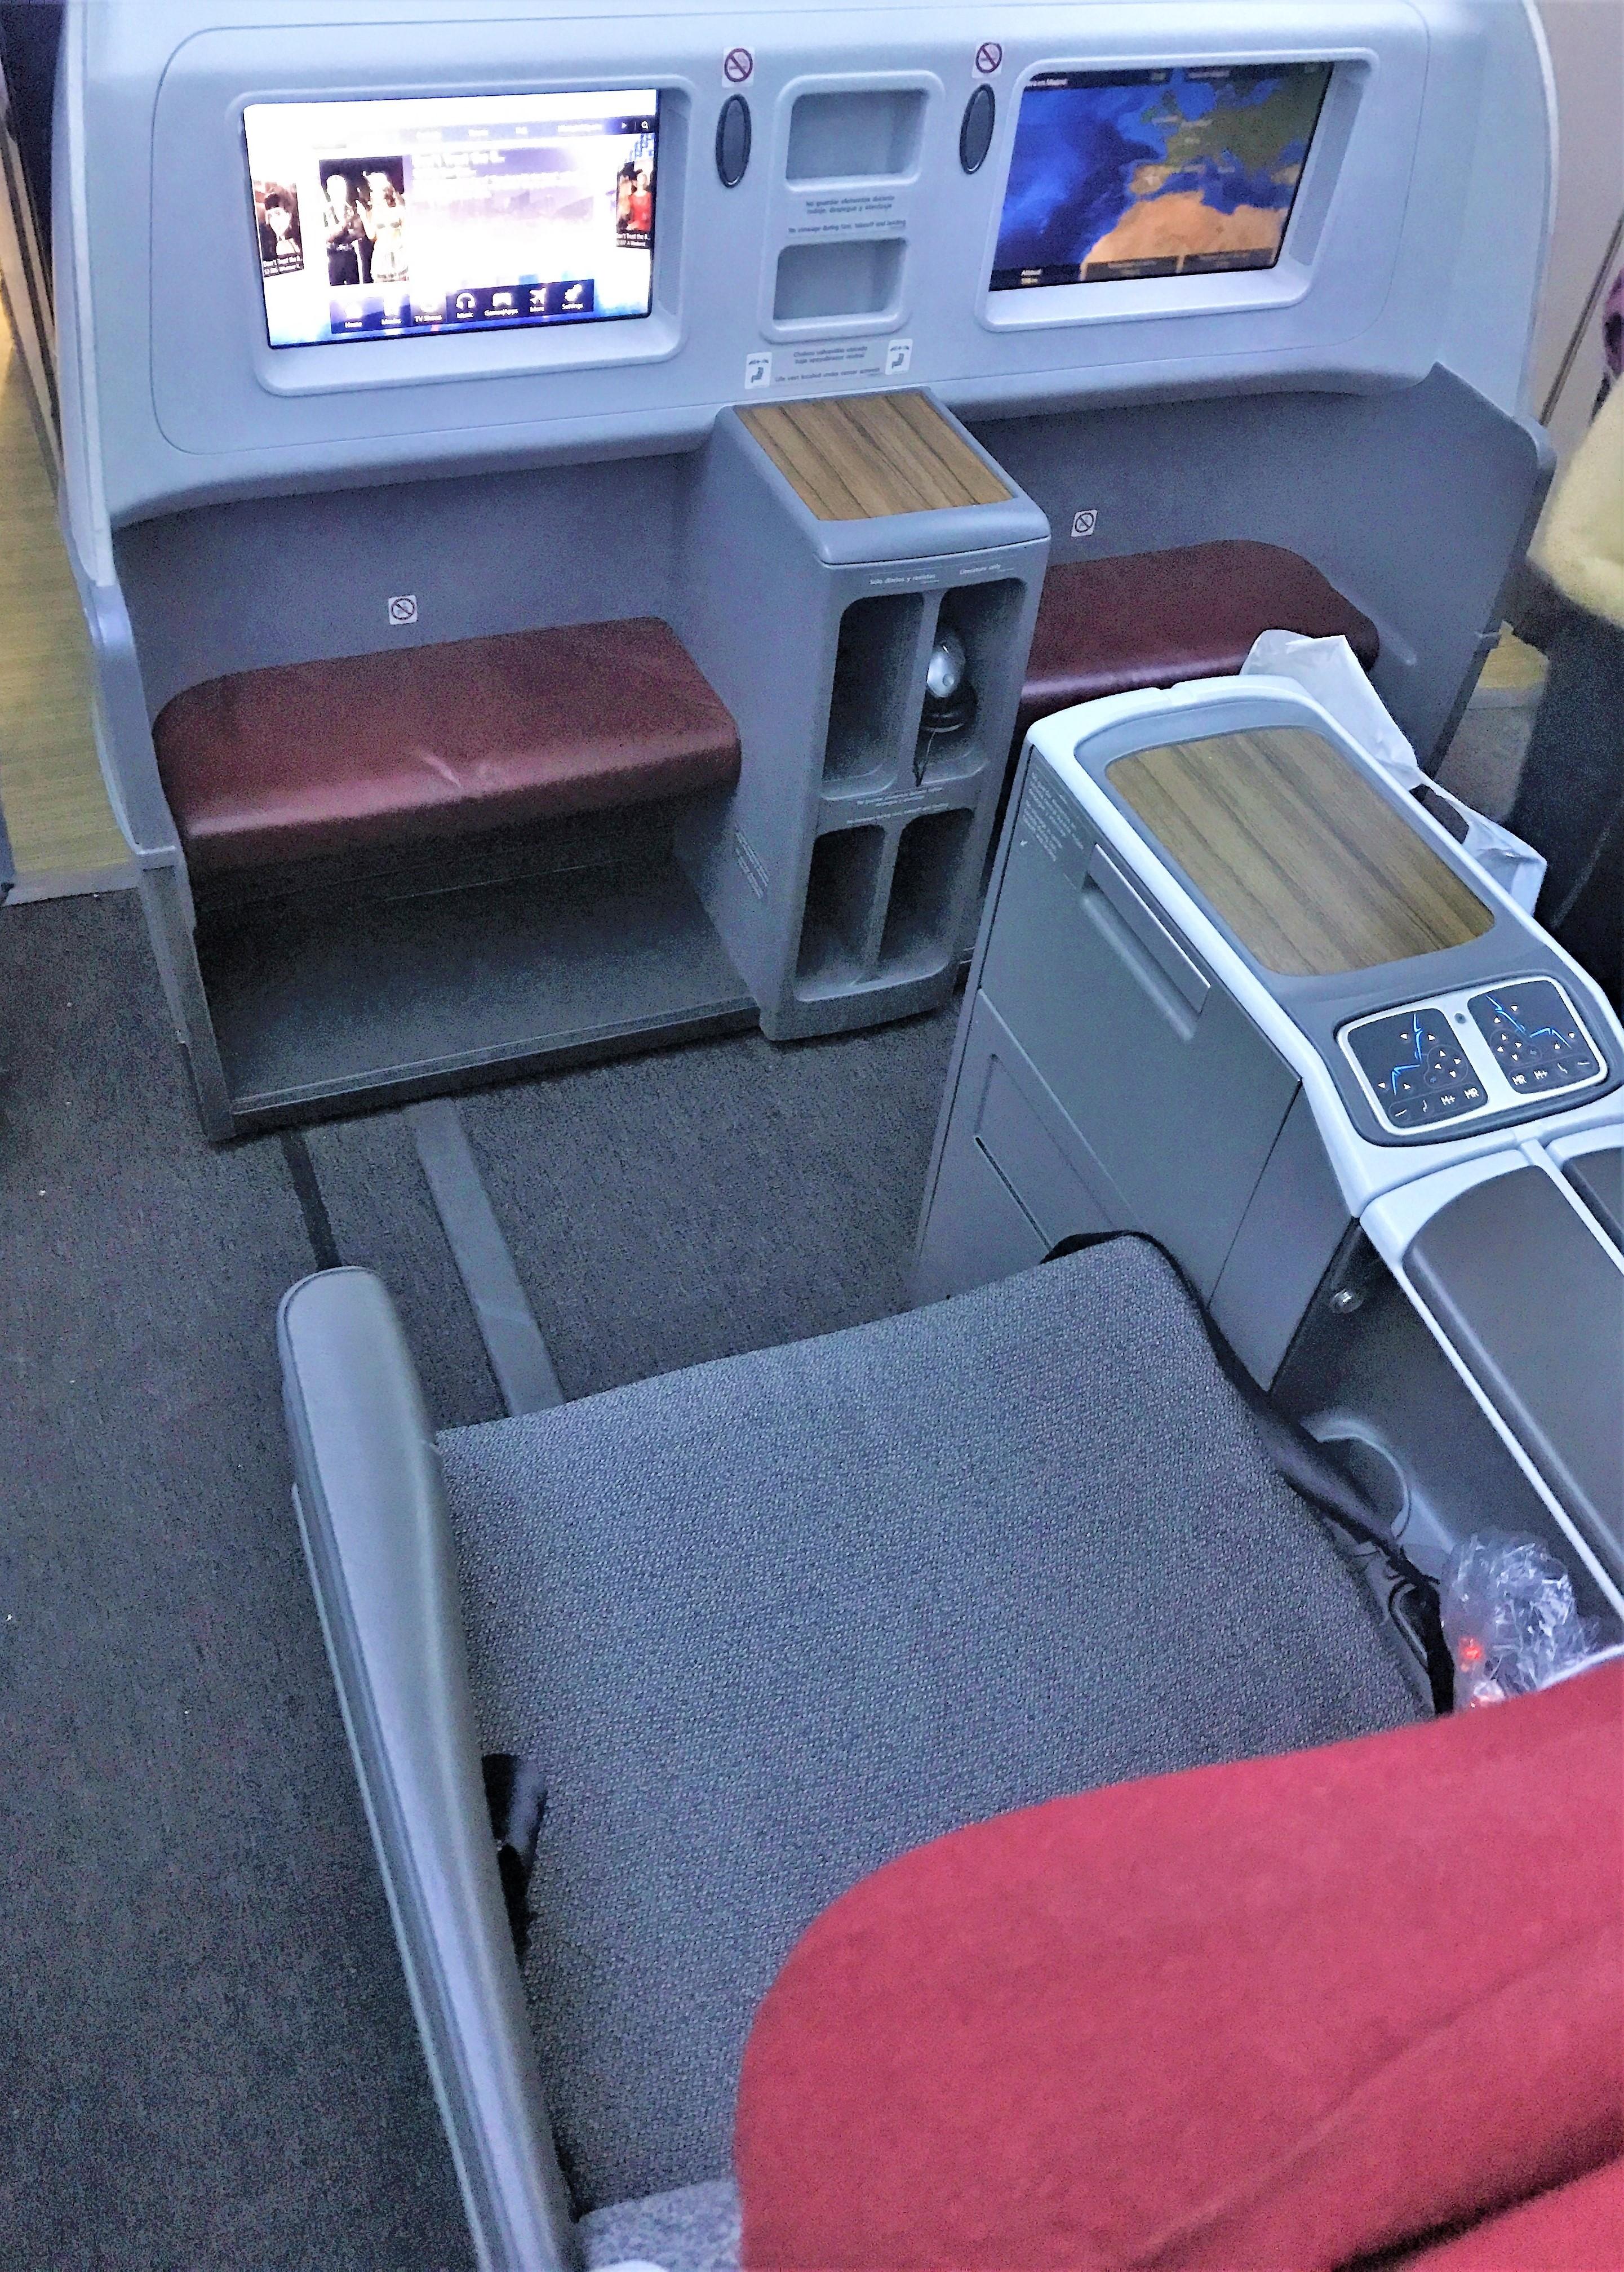 LATAM B787 business class review - Frankfurt to Madrid